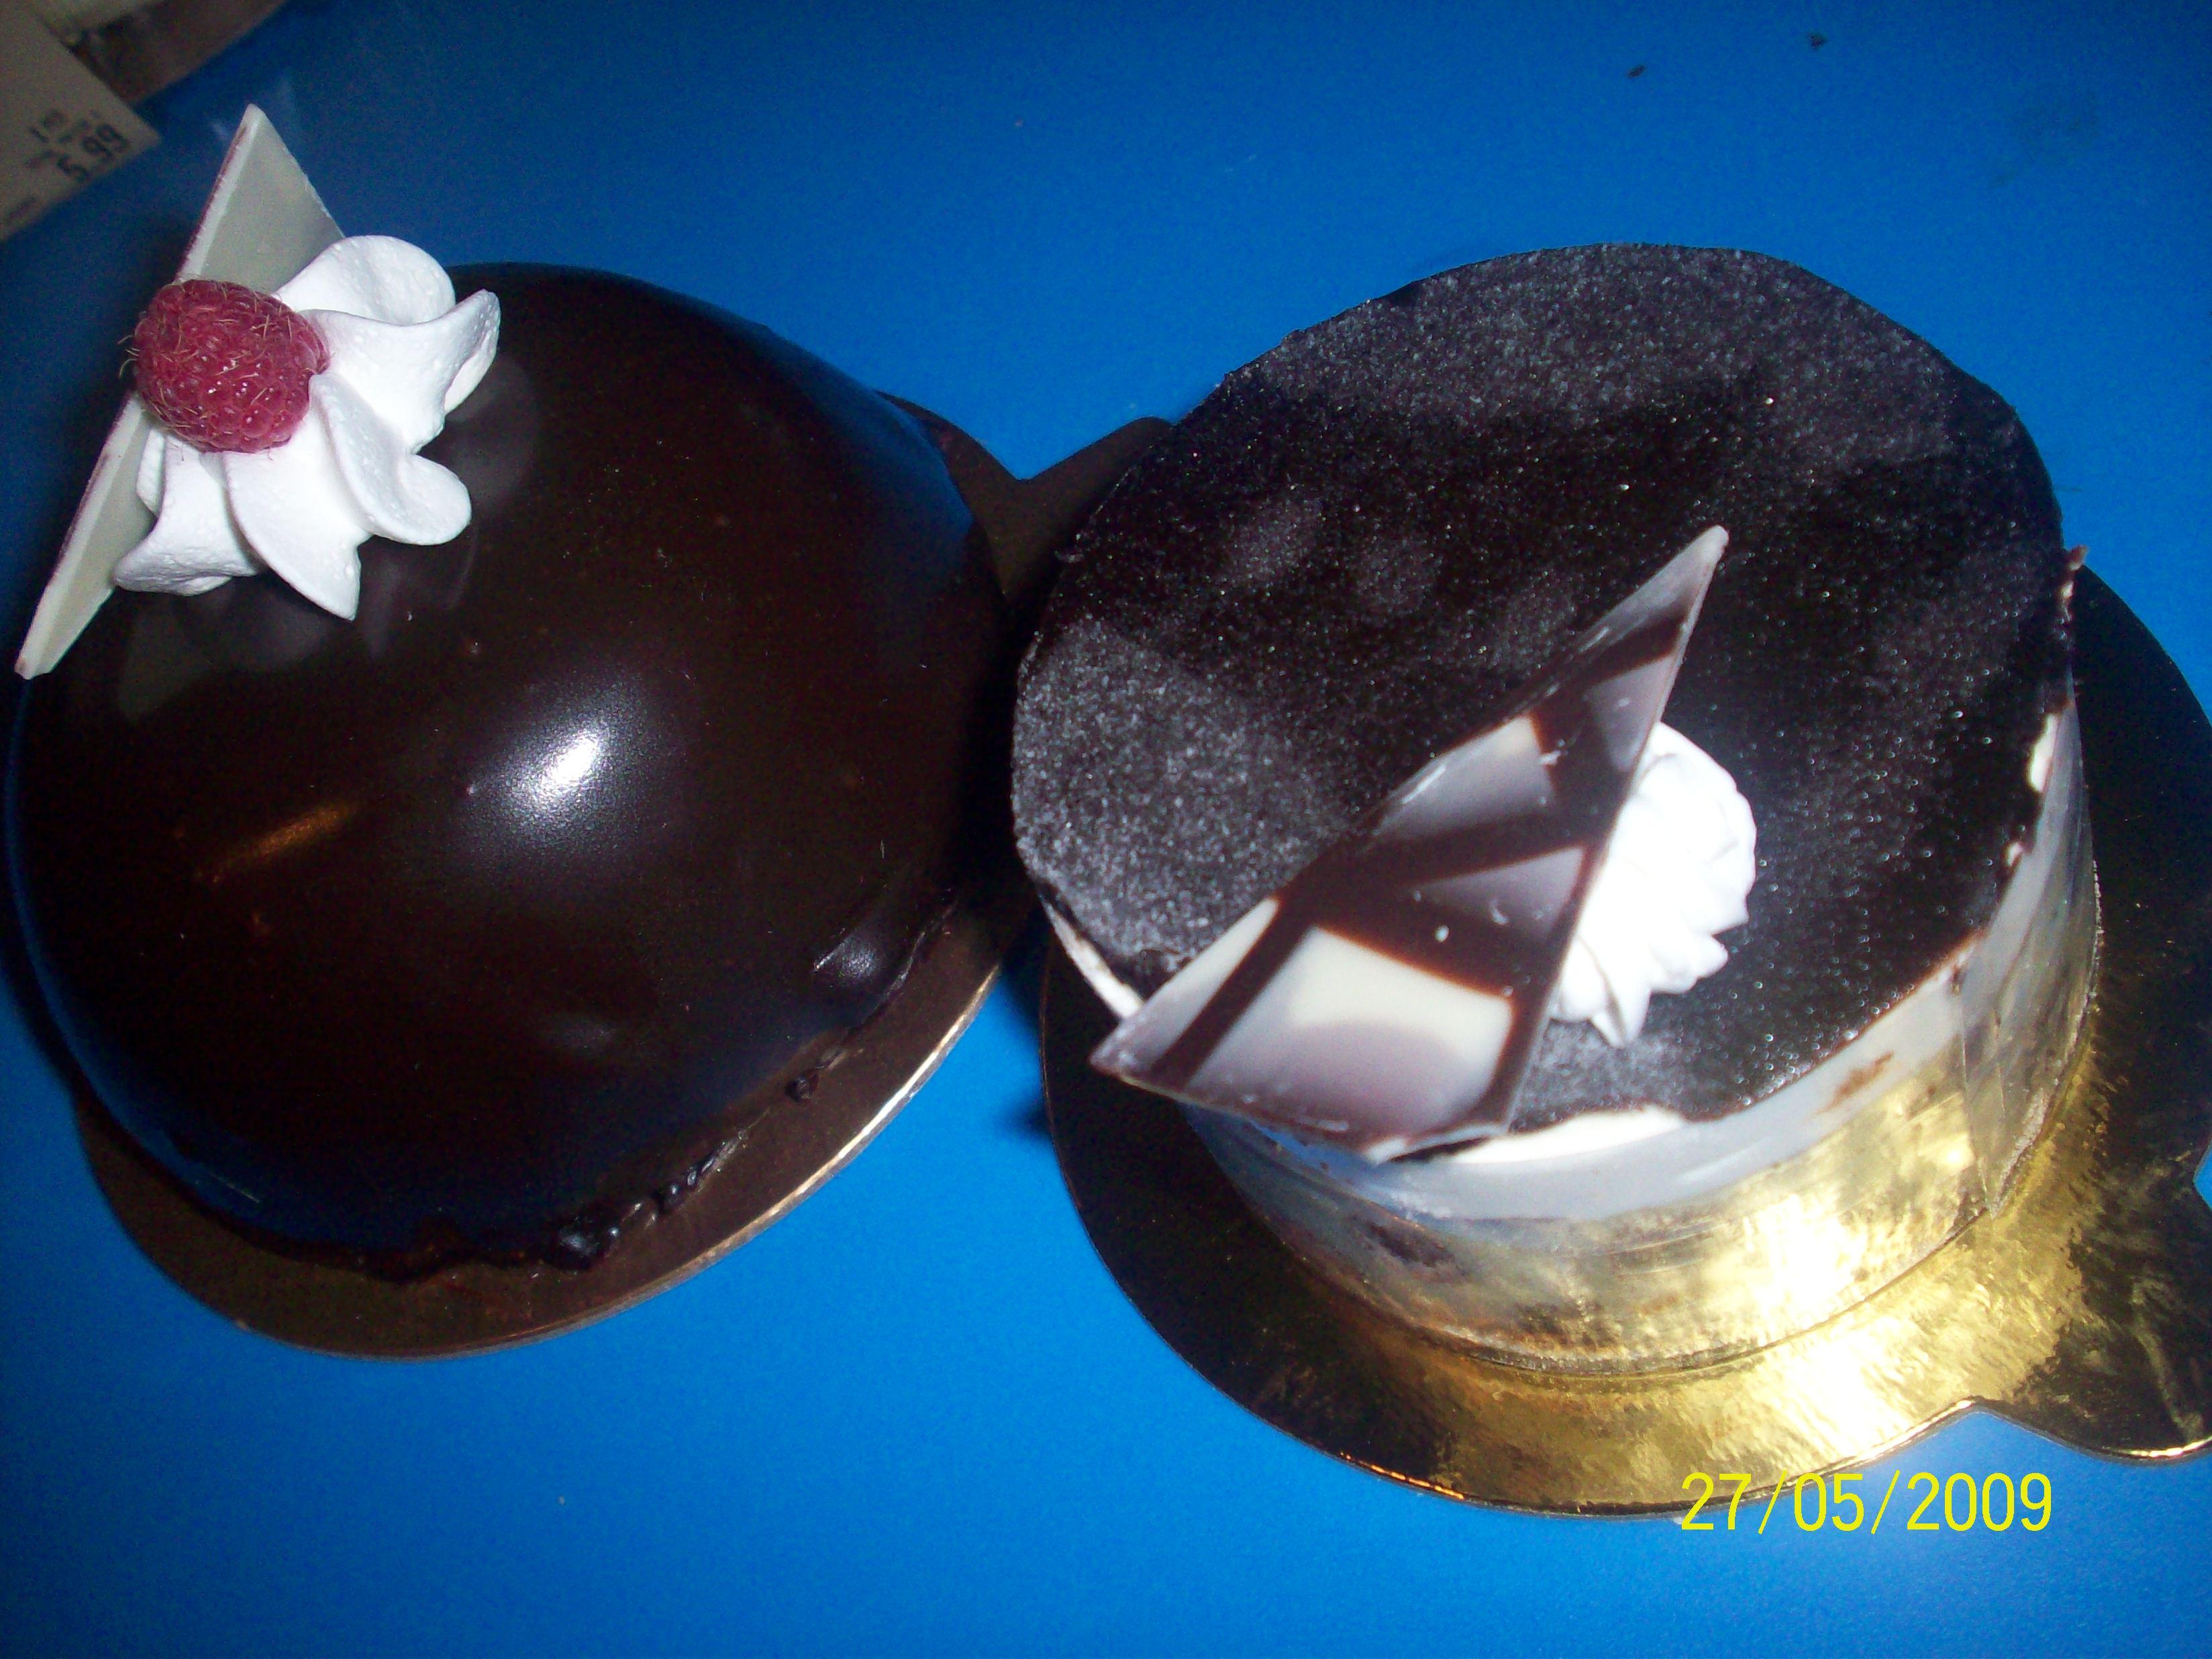 https://foodloader.net/cutie_2009-05-27_Mousse_Bombe_a_Chocolat.jpg